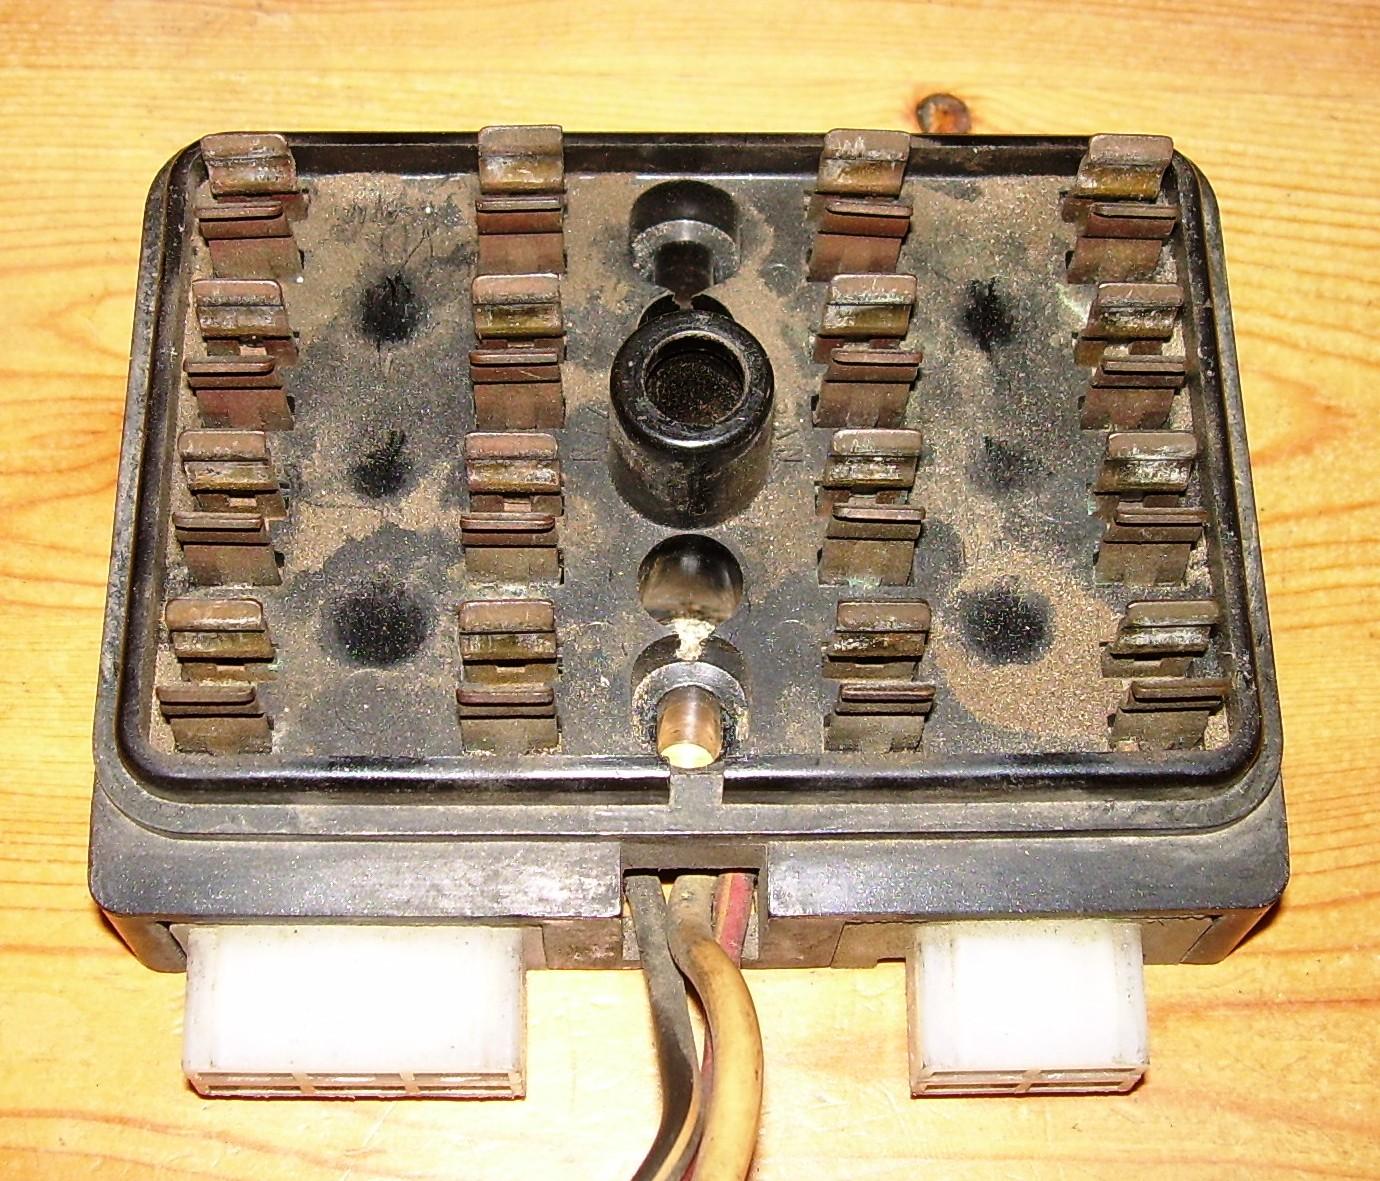 Datsun 510 Fuse Box Electrical Wiring Diagrams 260z Datsun510 Com 210 Before Vinegar Soak Top